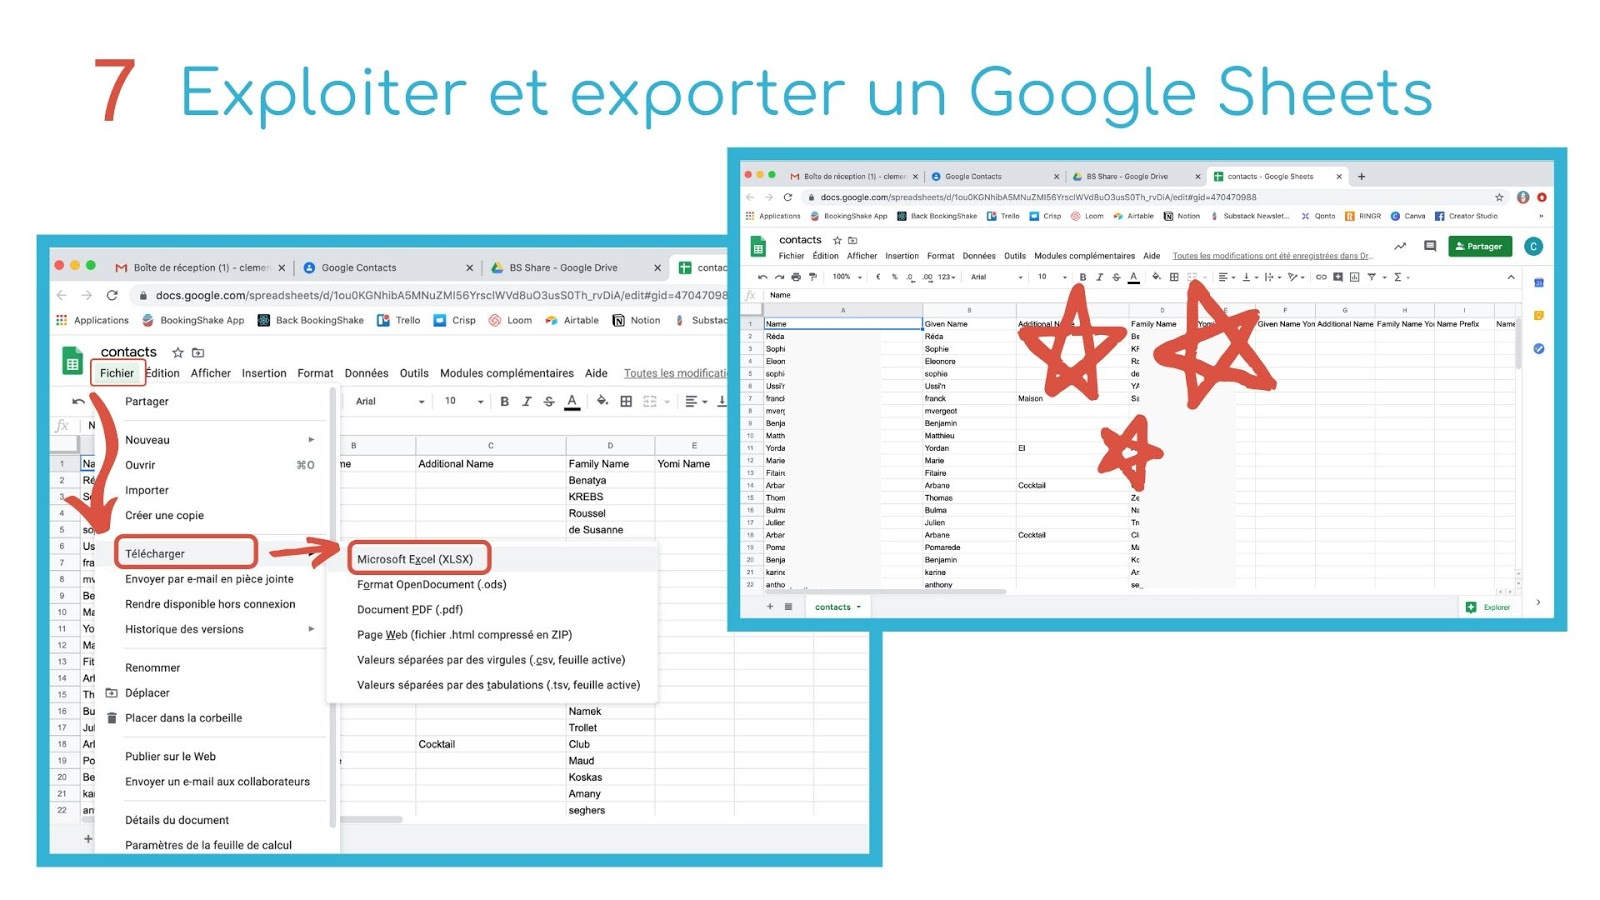 exporter google shhets